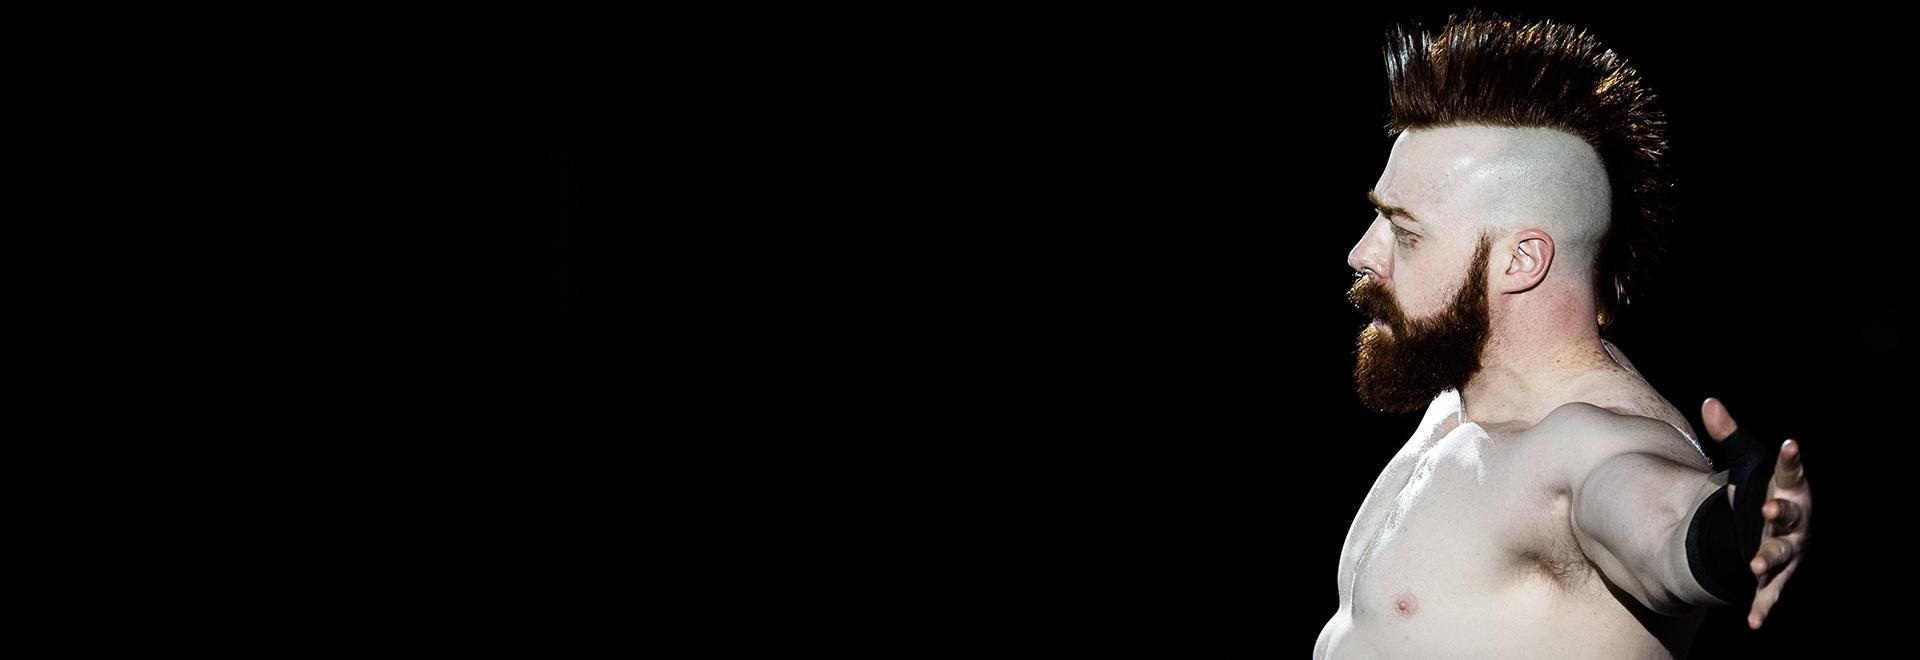 Ep. 22